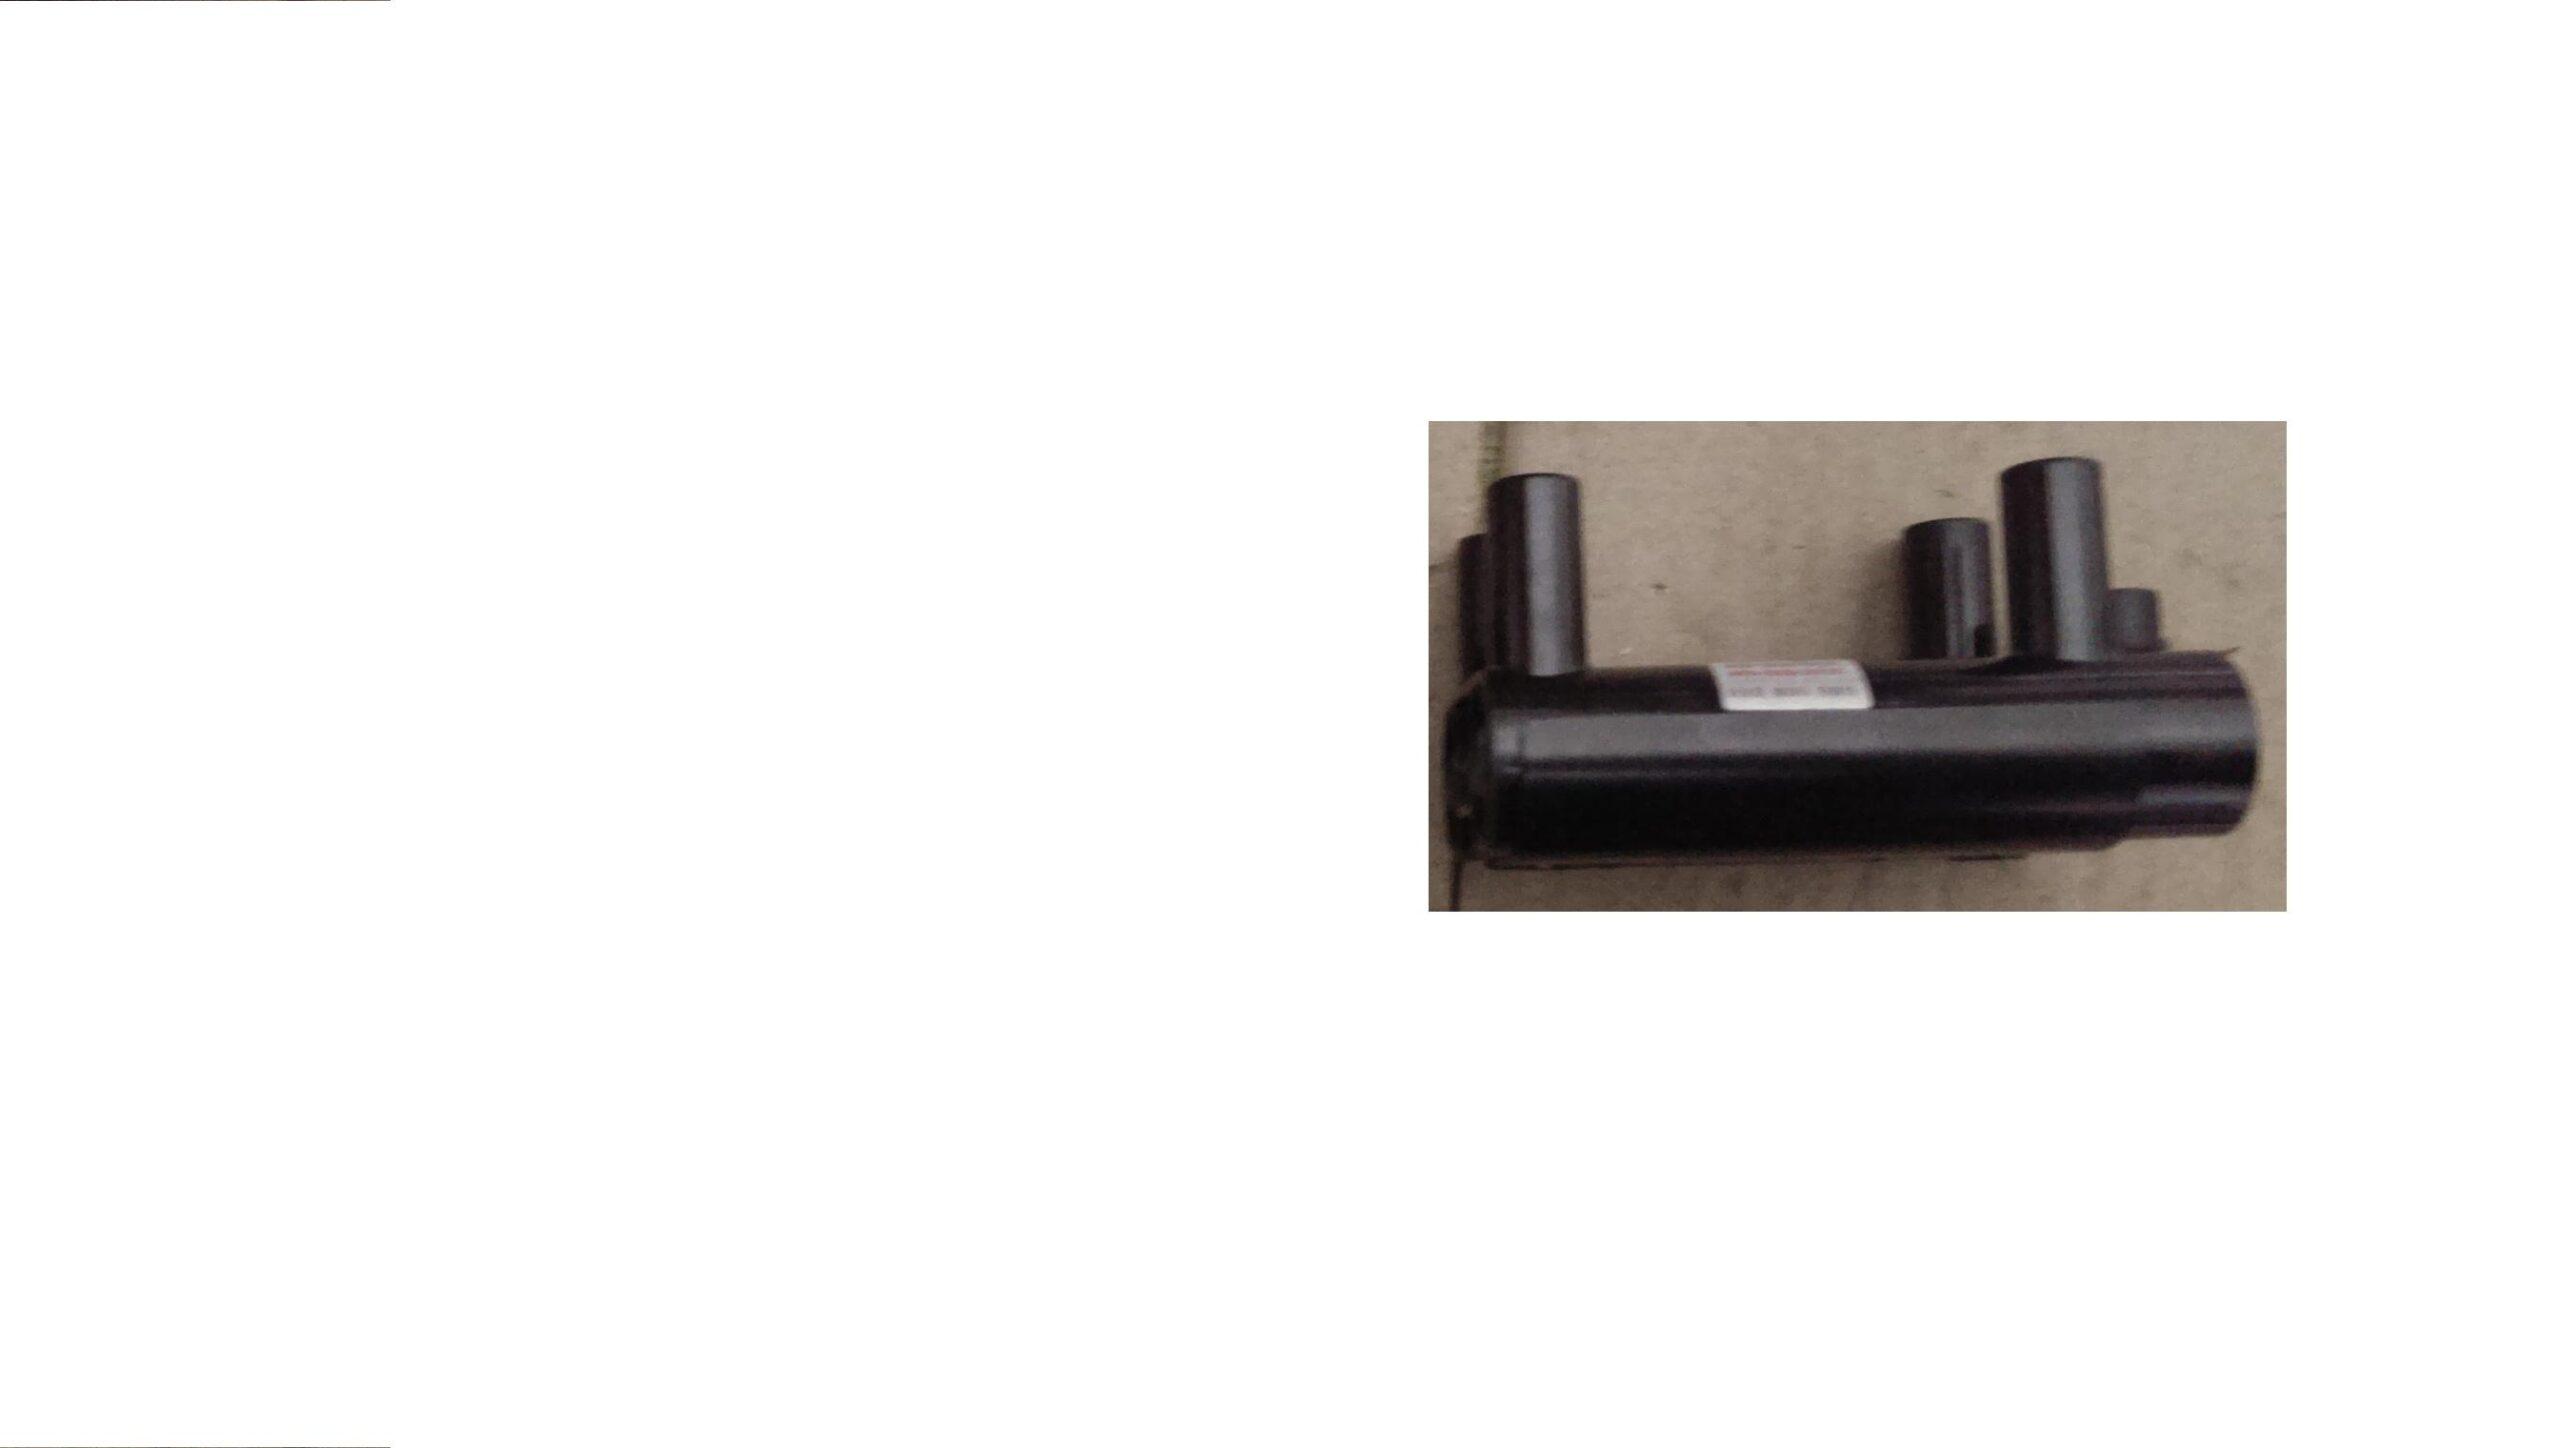 Модуль запалювання 2,2i (491Q)-ME/ модуль зажигания/ катушка зажигания-1186